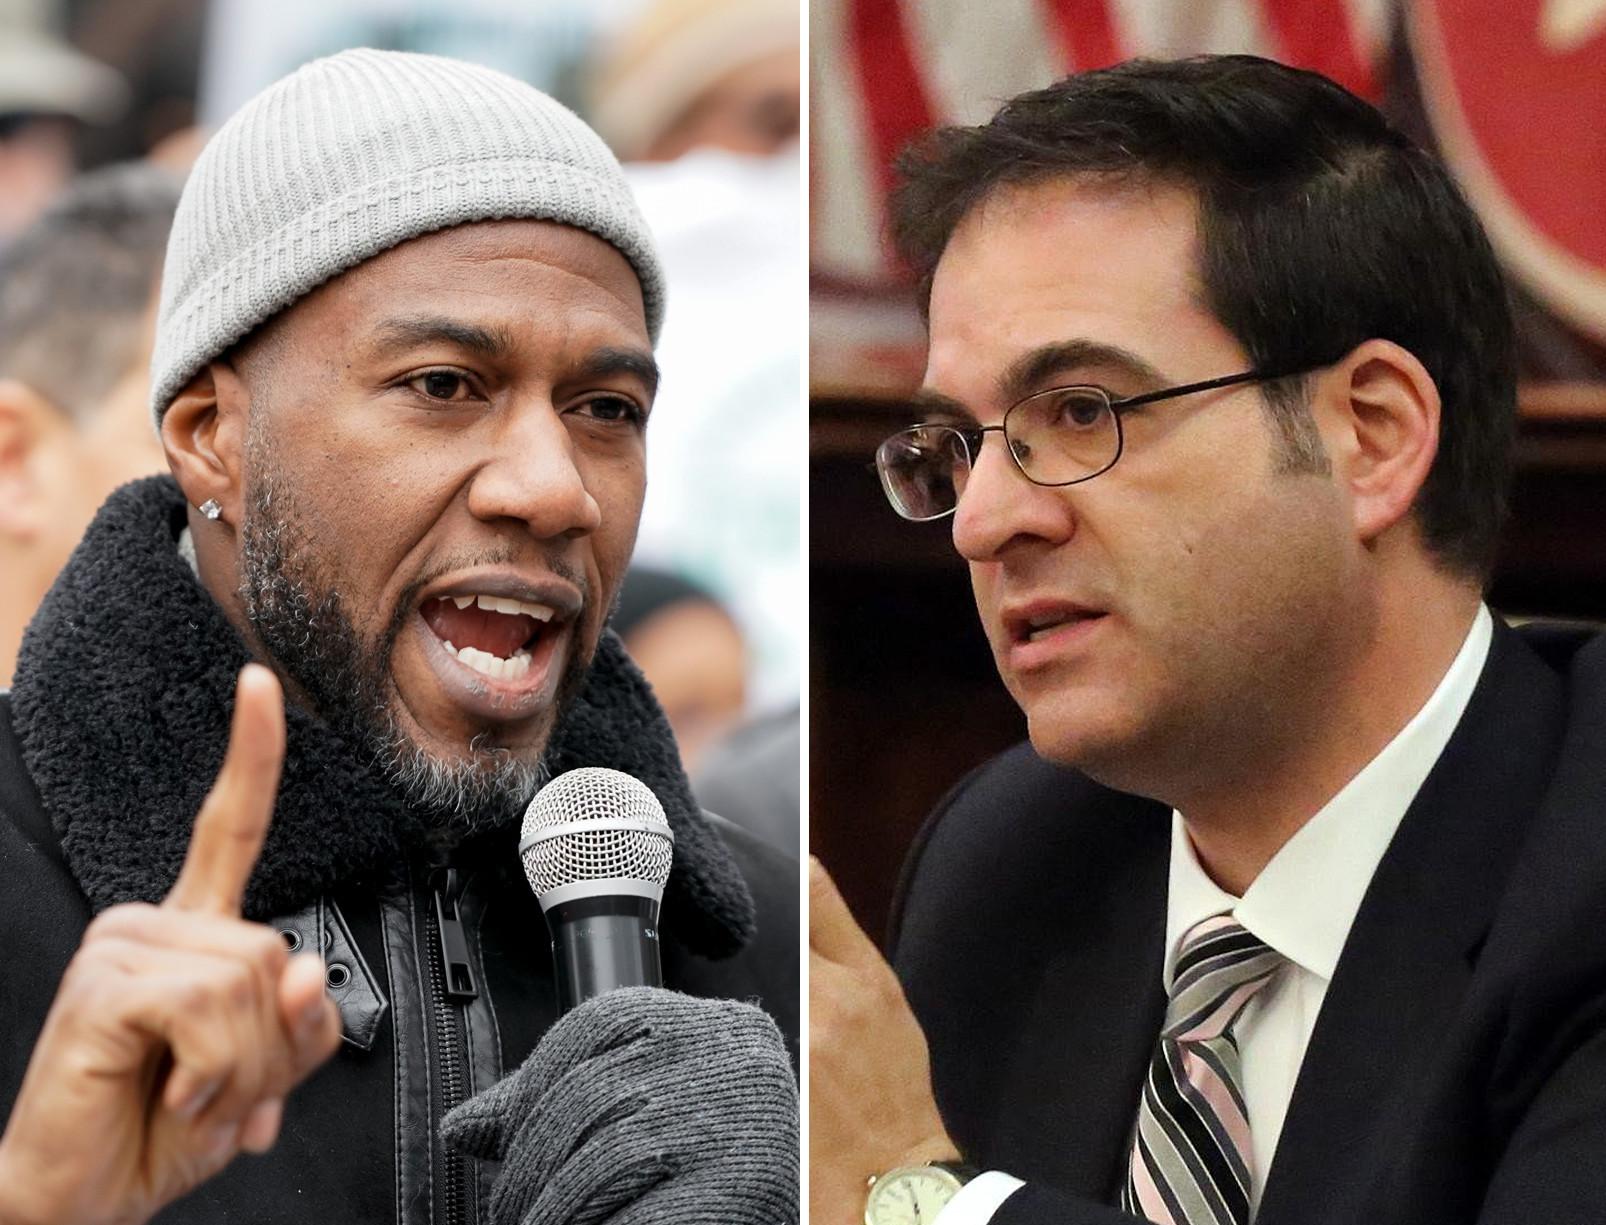 Public Advocate Jumaane Williams feuds with Brooklyn councilman over anti-Semitism